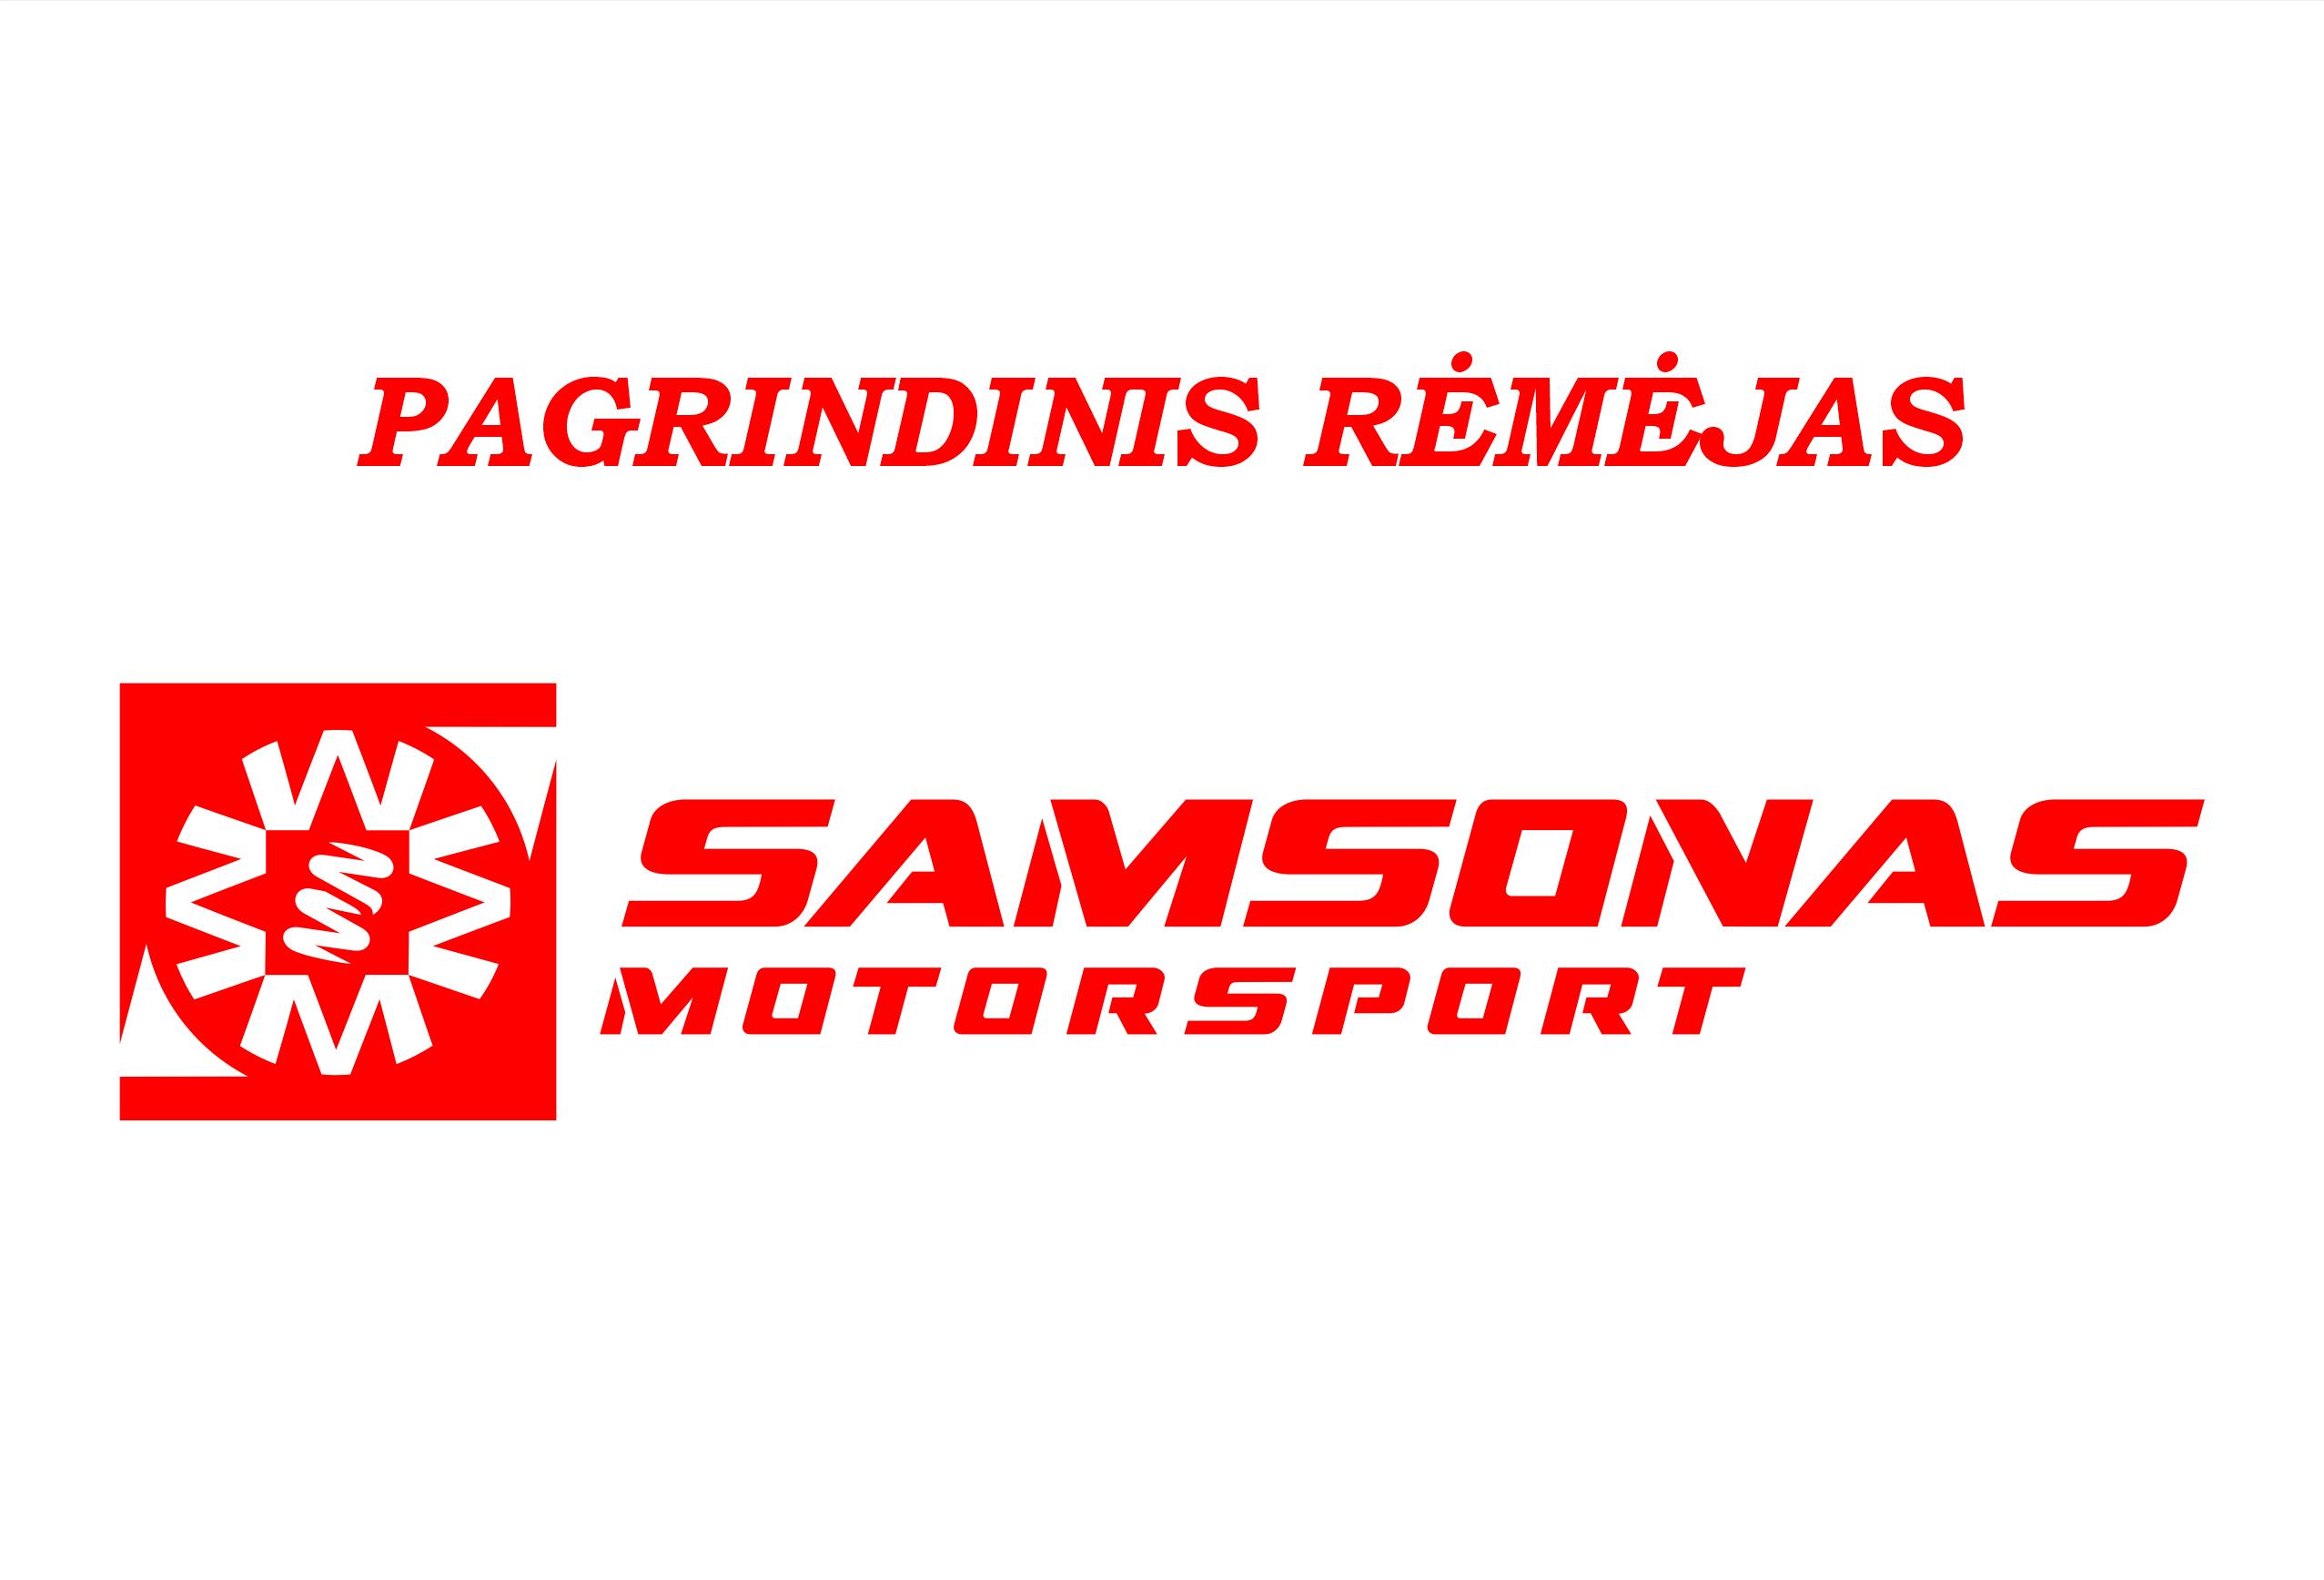 Samsonas motorsport